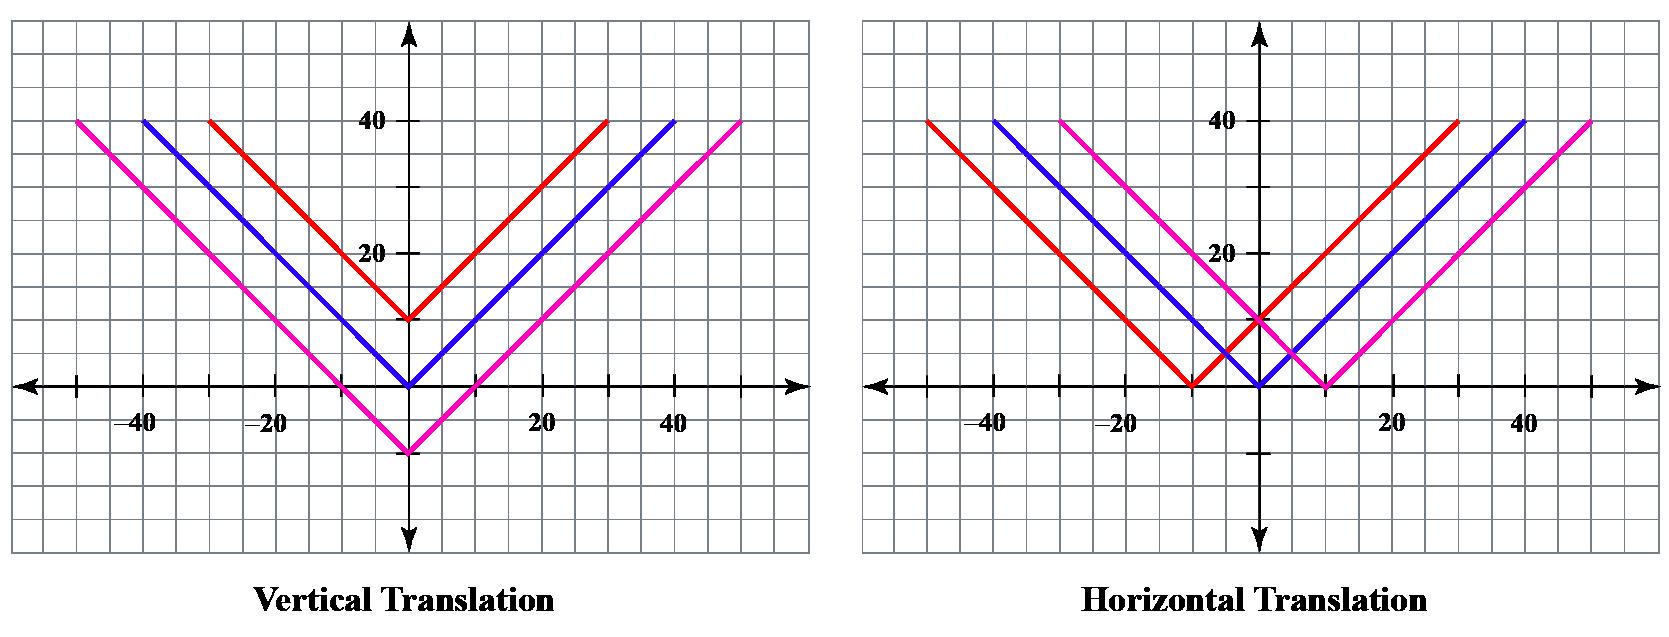 Vertical and horizontal translation graph